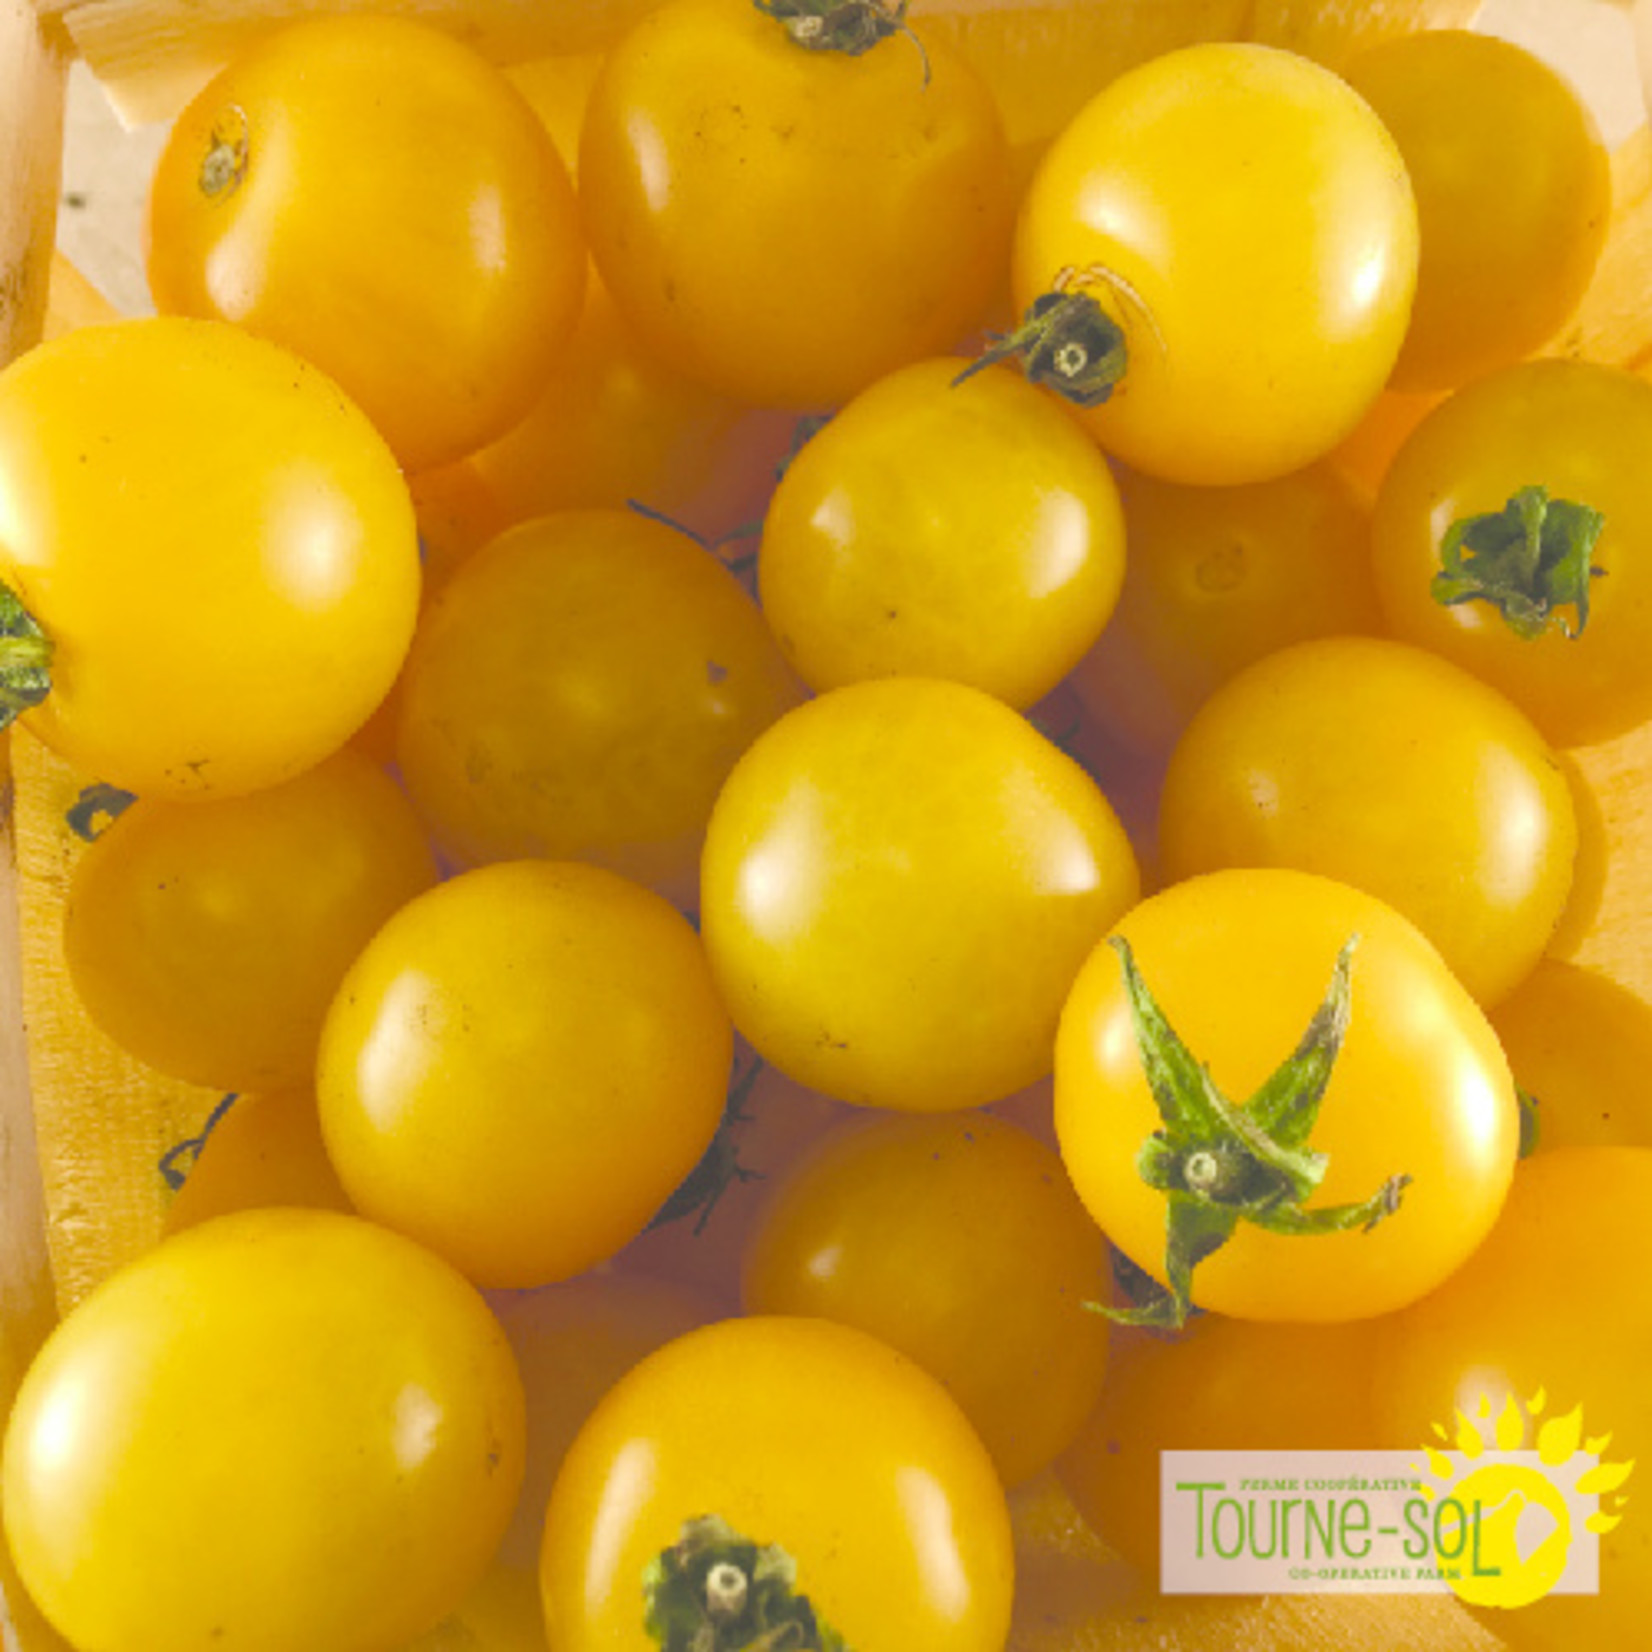 Tourne-Sol Galina yellow cherry tomato